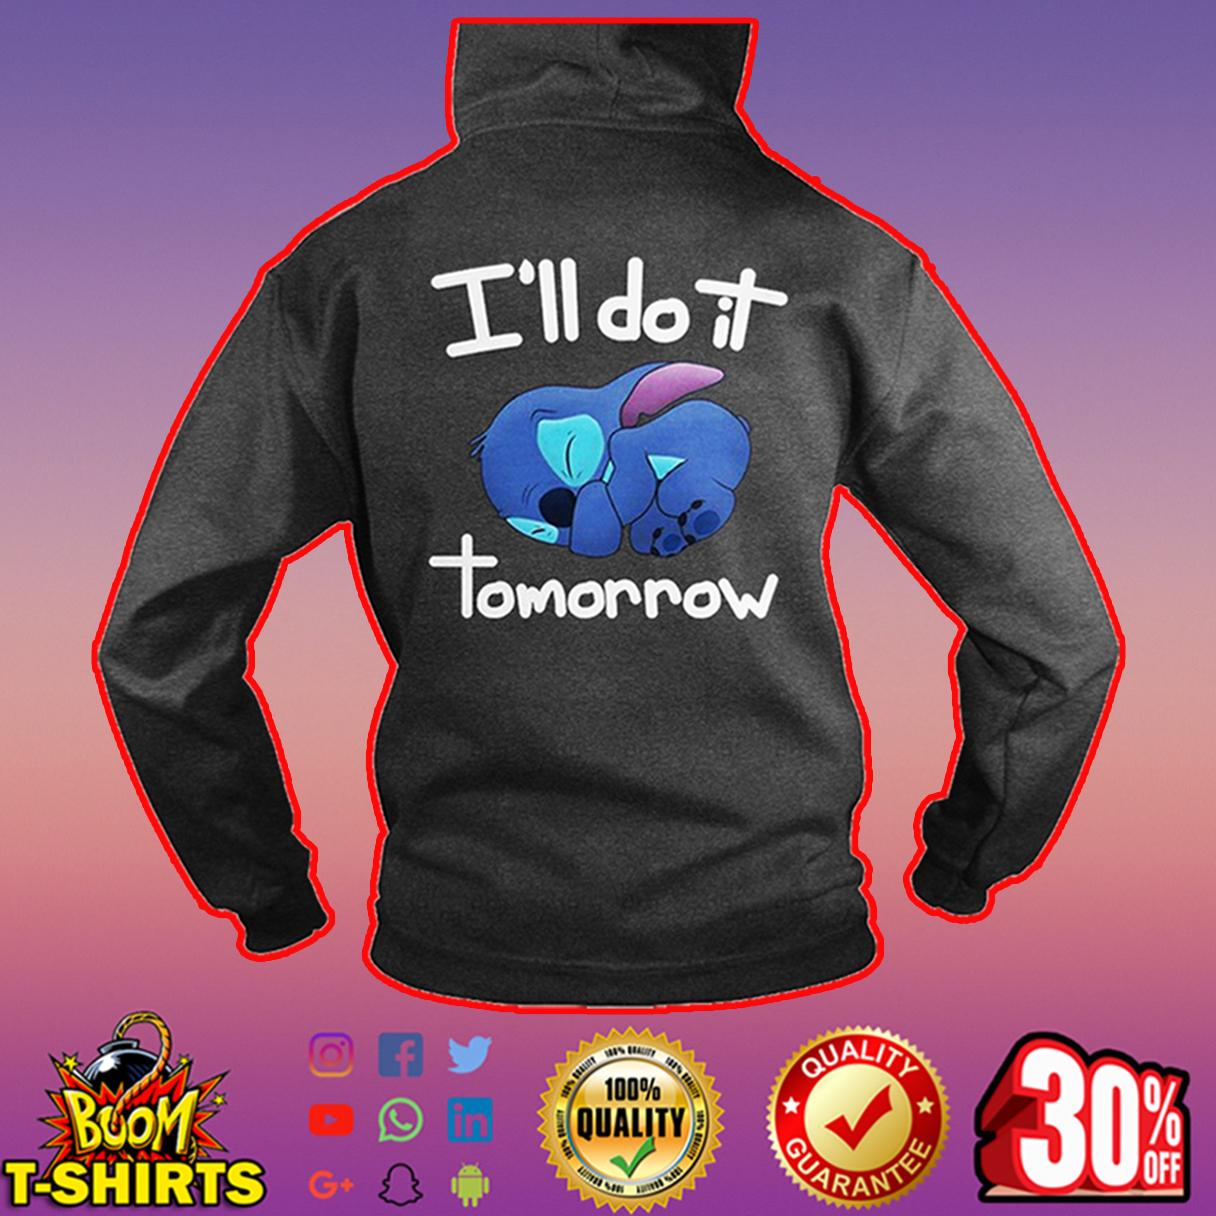 I'll do it tommorow Stitch hoodie - drak gray